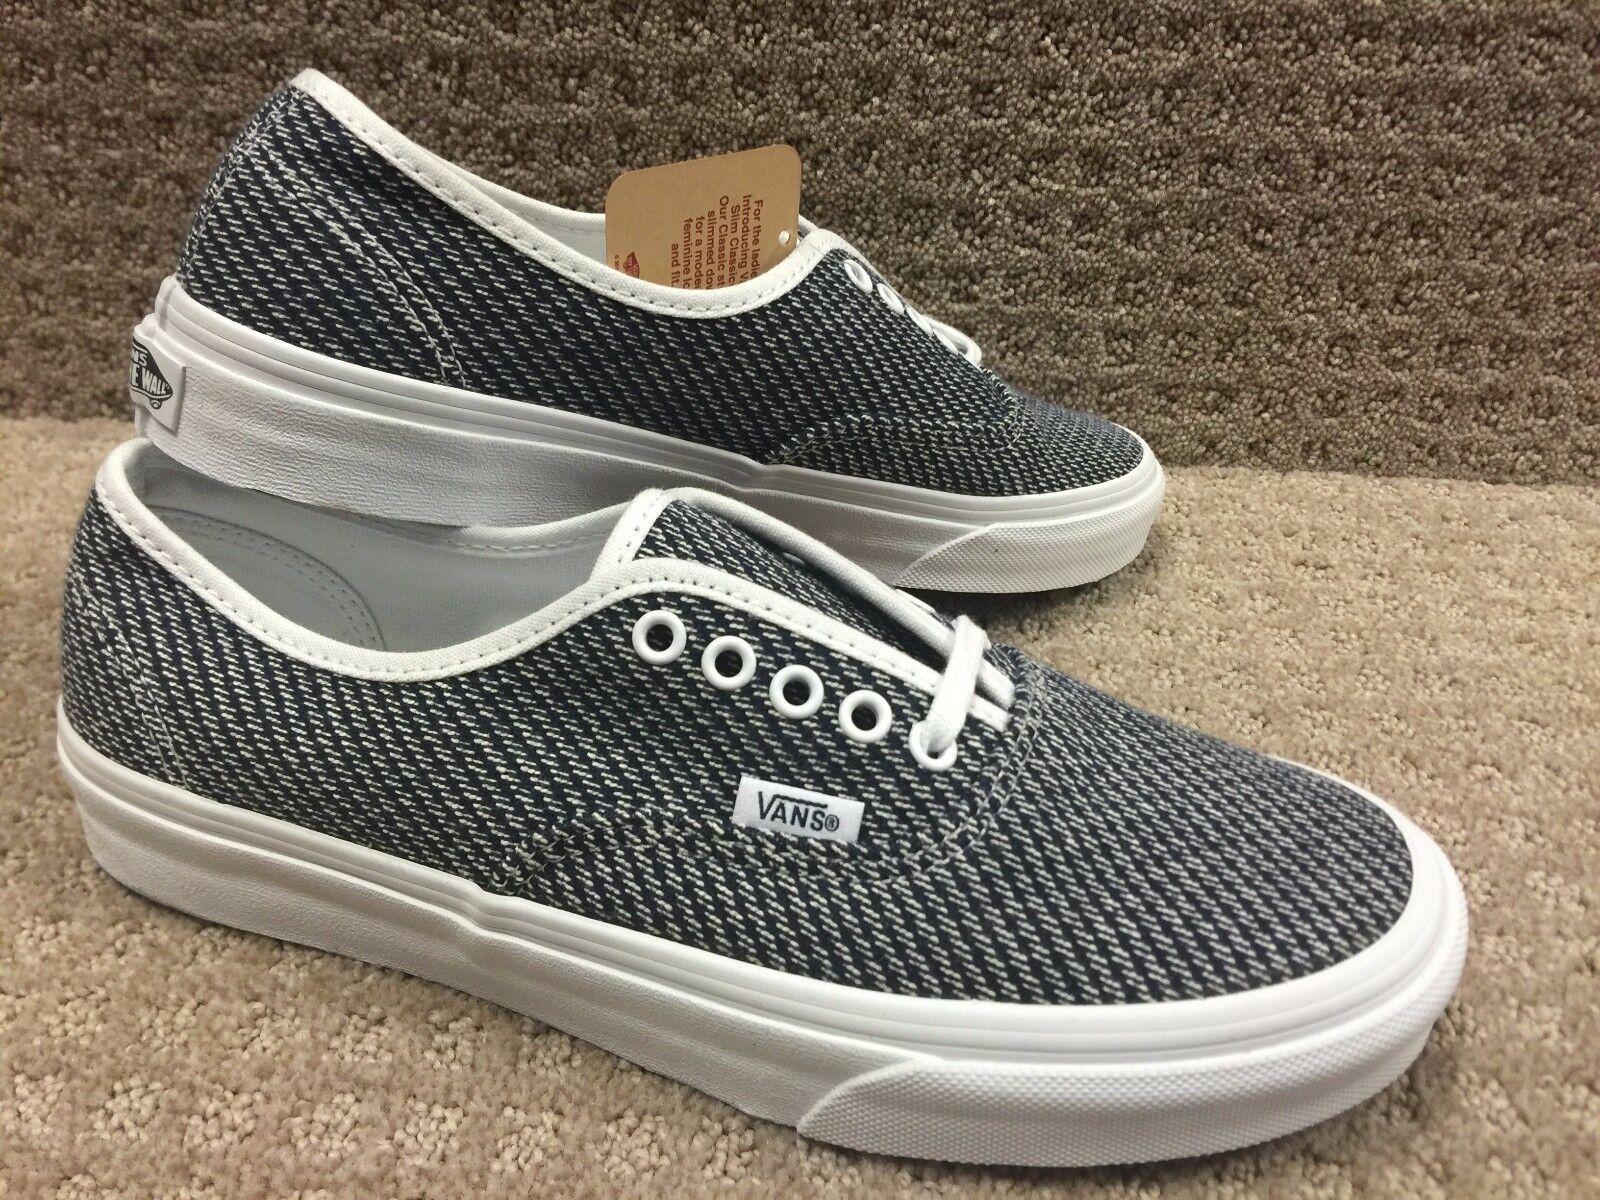 Vans Men's shoes Authentic Slim -- (Jersey) Navy True White